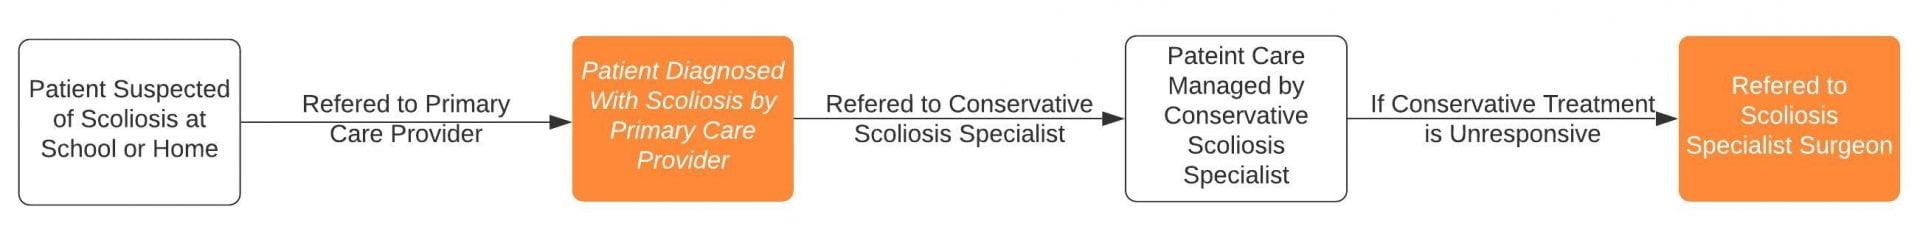 future path of care for scoliosis